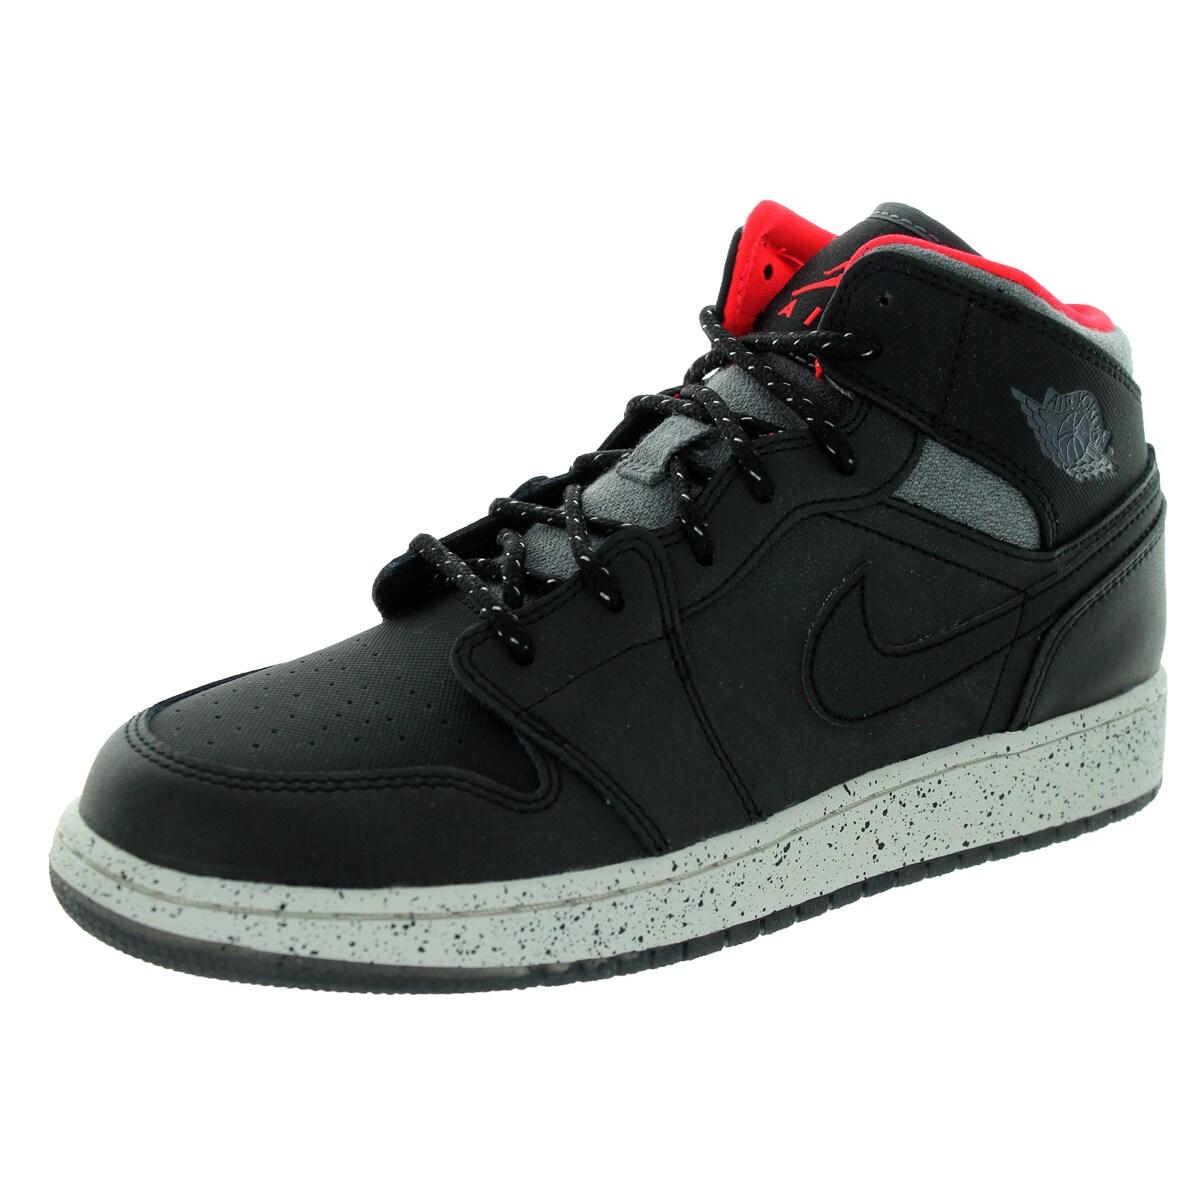 c589dbef365 Nike Jordan Kid s Air Jordan 1 Mid Holiday Bg Black Dark Grey  Basketball  Shoe